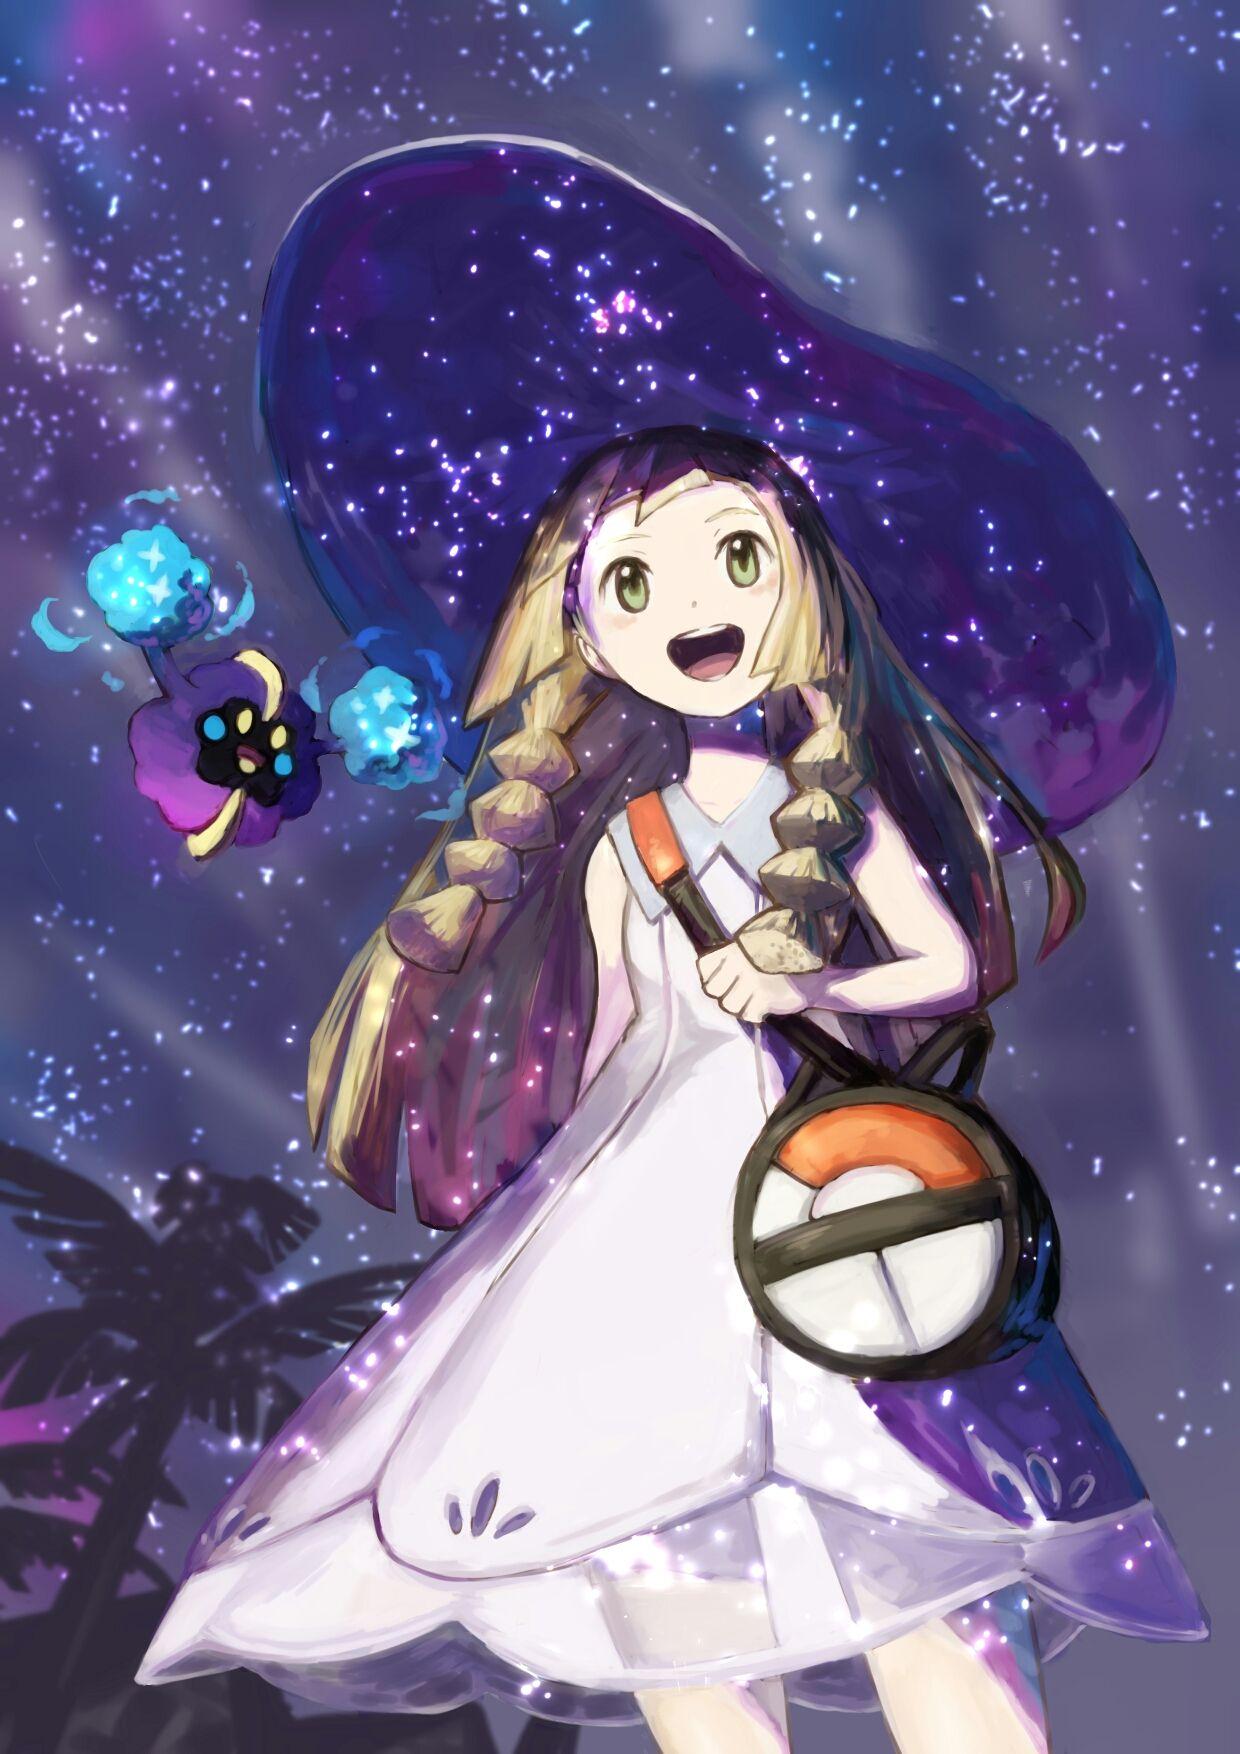 Artist: Pixiv Id 15871673 | Pokémon Sun & Moon | Cosmog | Lillie